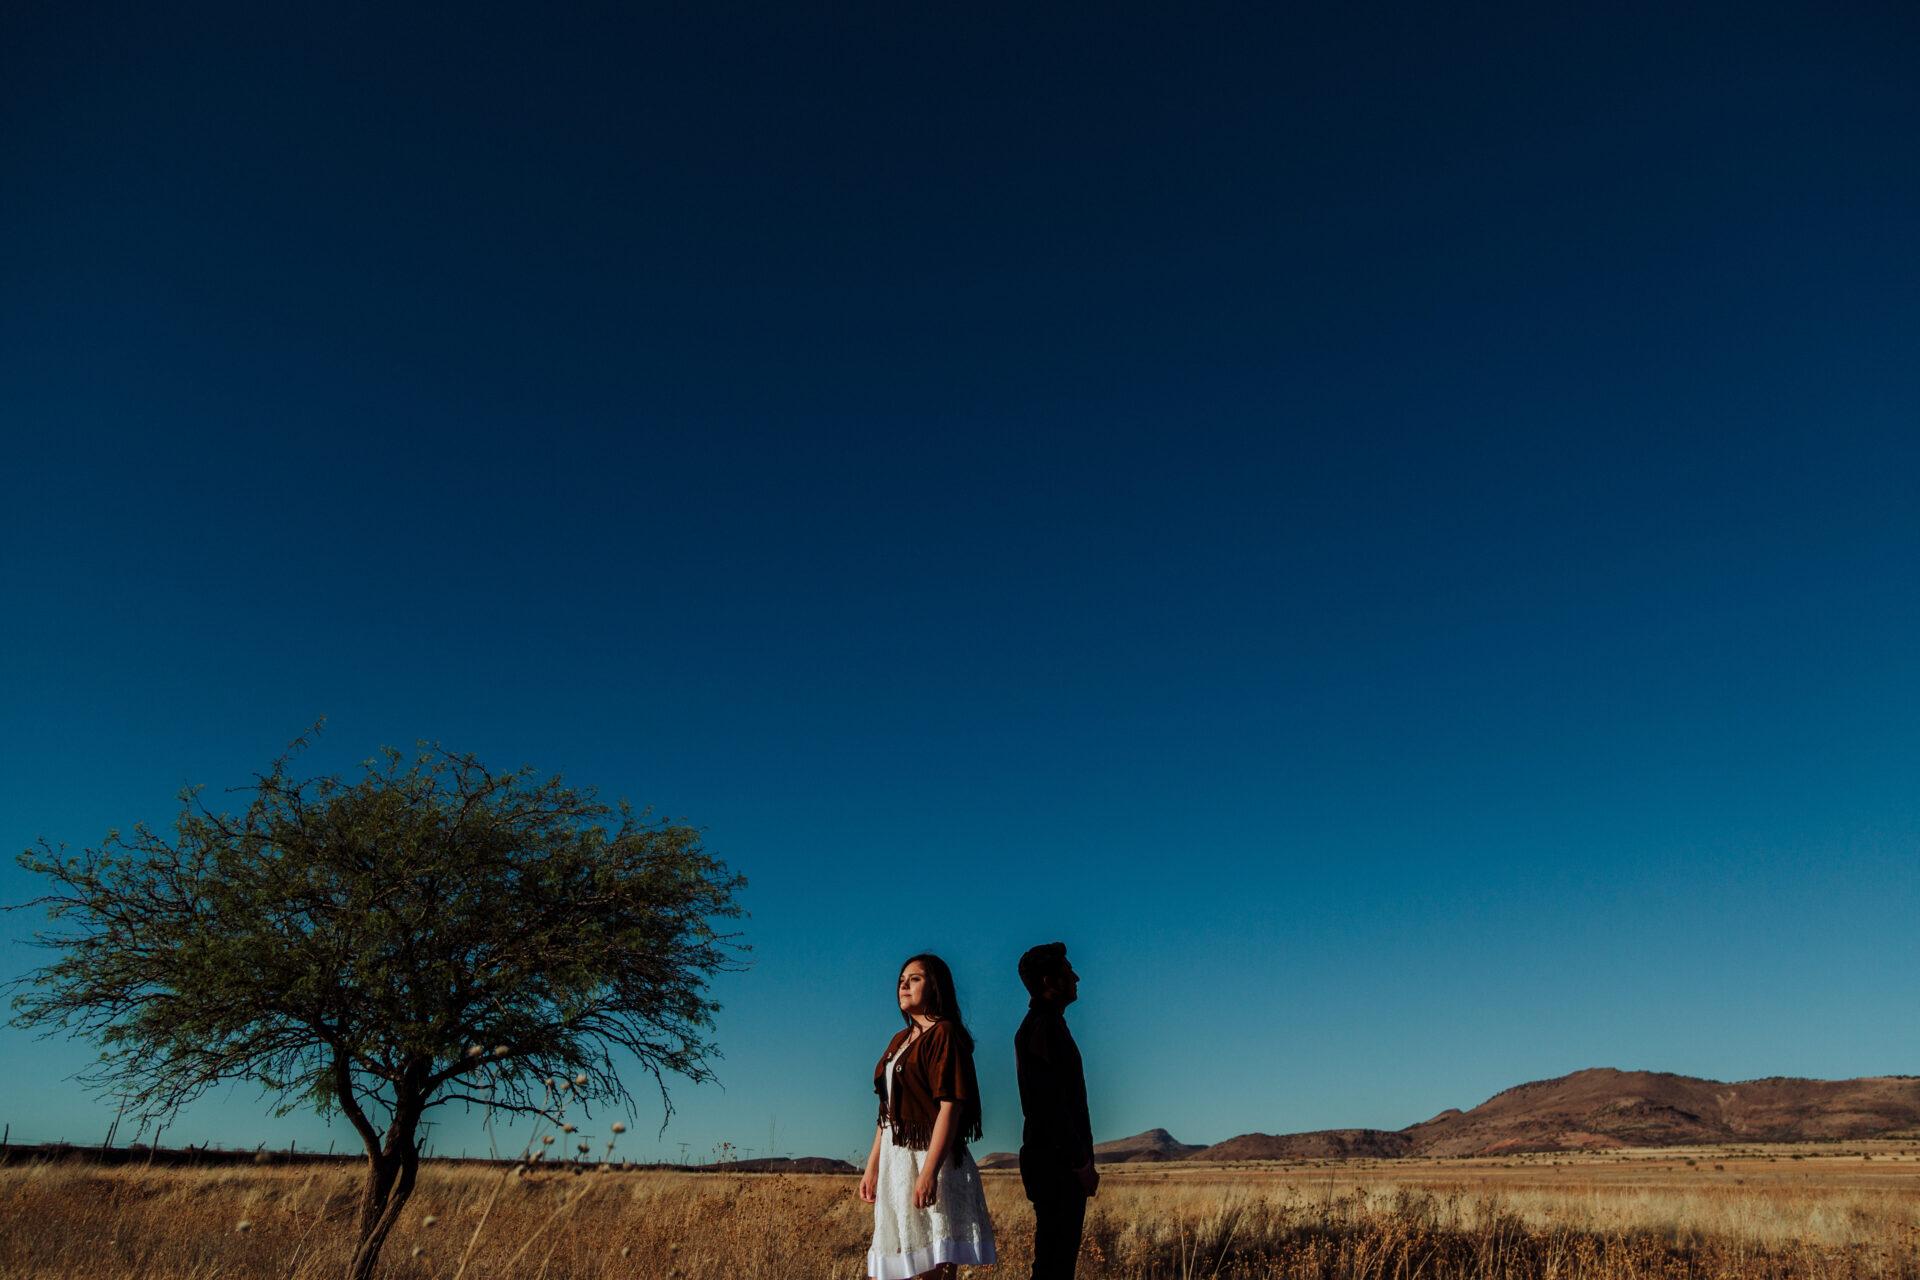 javier_noriega_fotografo_bodas_zacatecas_chihuahua_wedding_photographer3